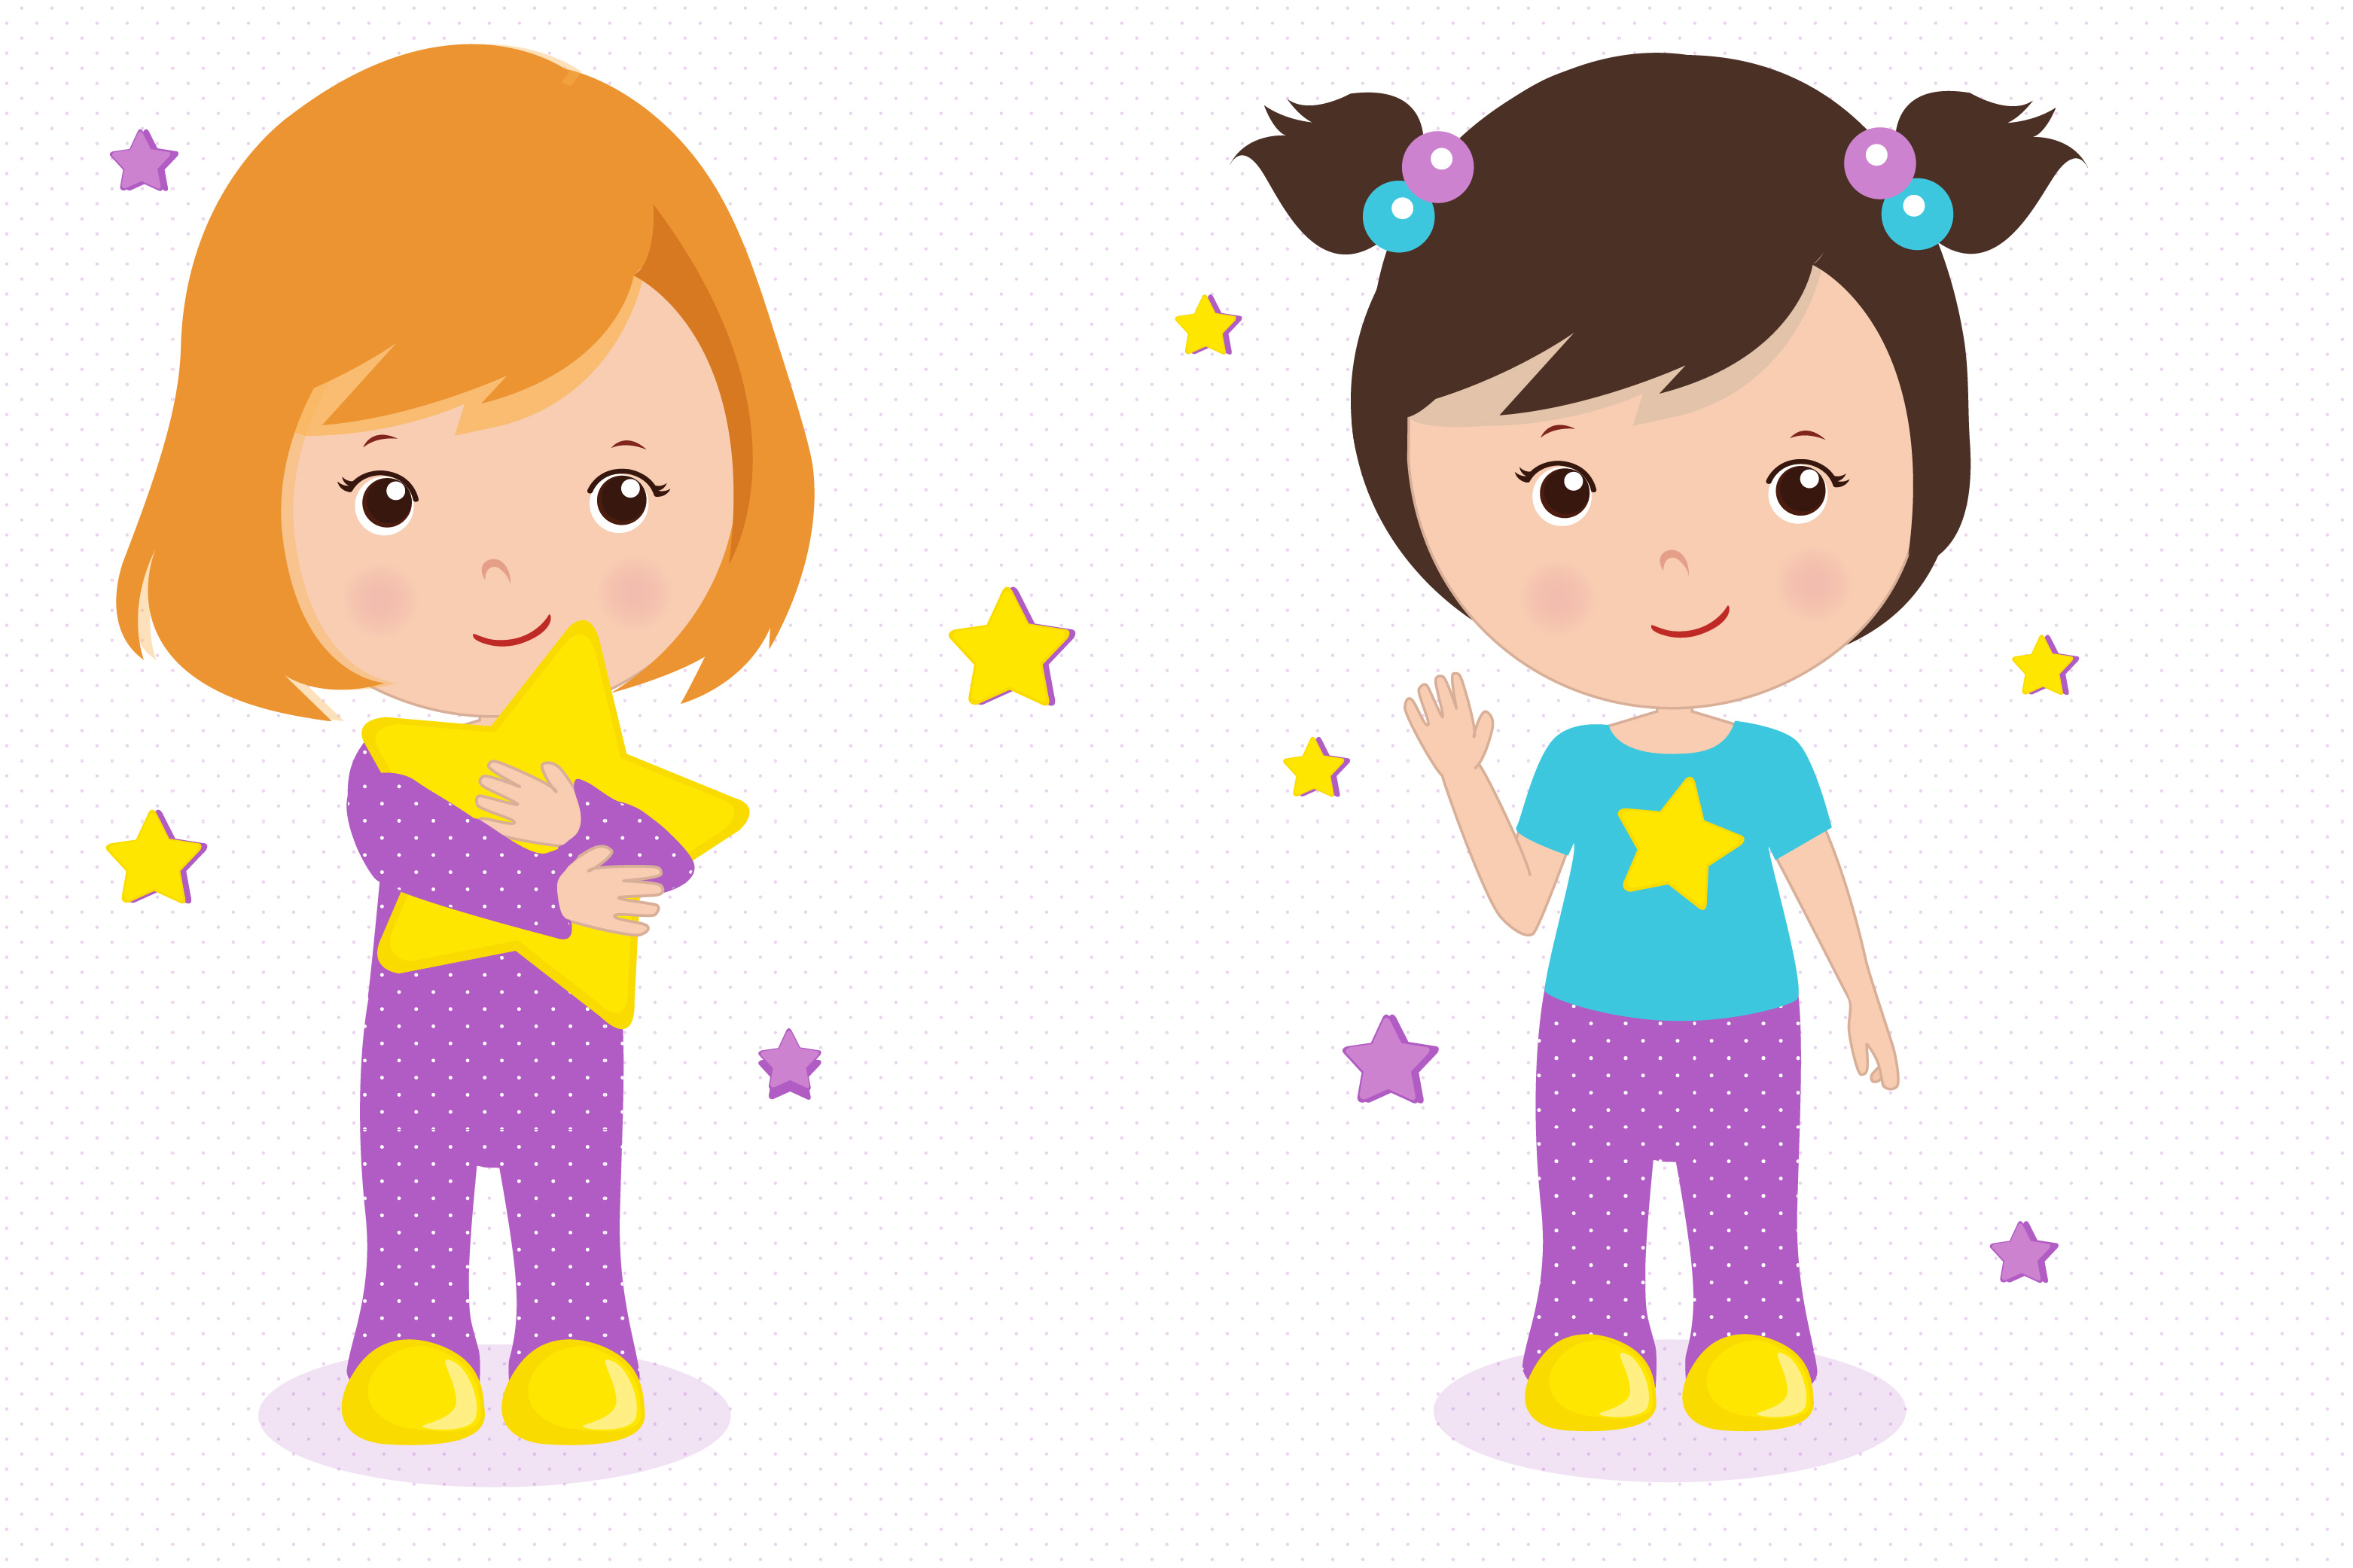 sleepover graphics little girls clipar design bundles rh designbundles net girl clipart png girl clipart png